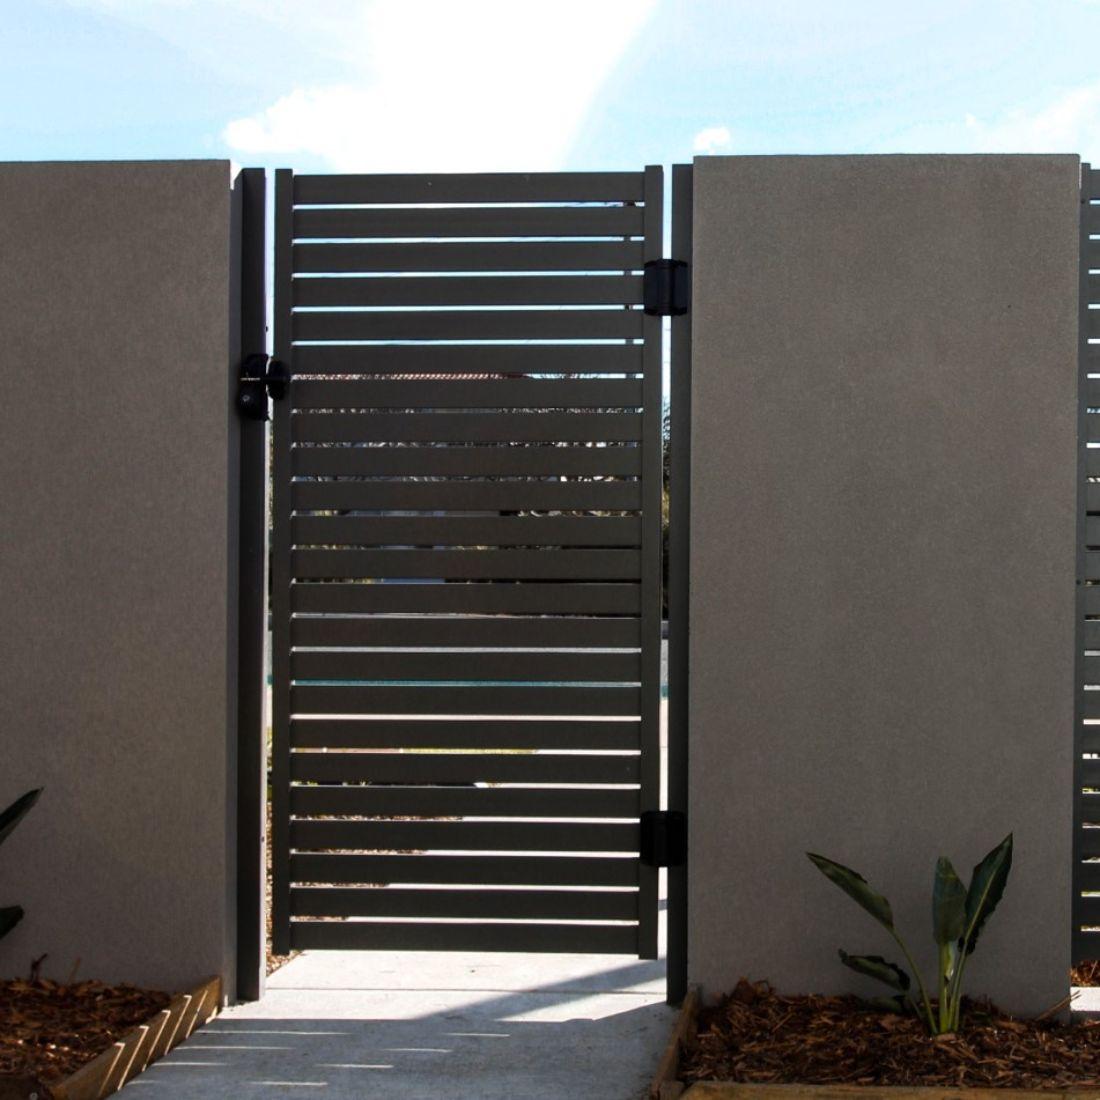 R Range Pedestrain Gate Charcoal 1000 x 1800mm ELI-GATE-CHC-1018BX